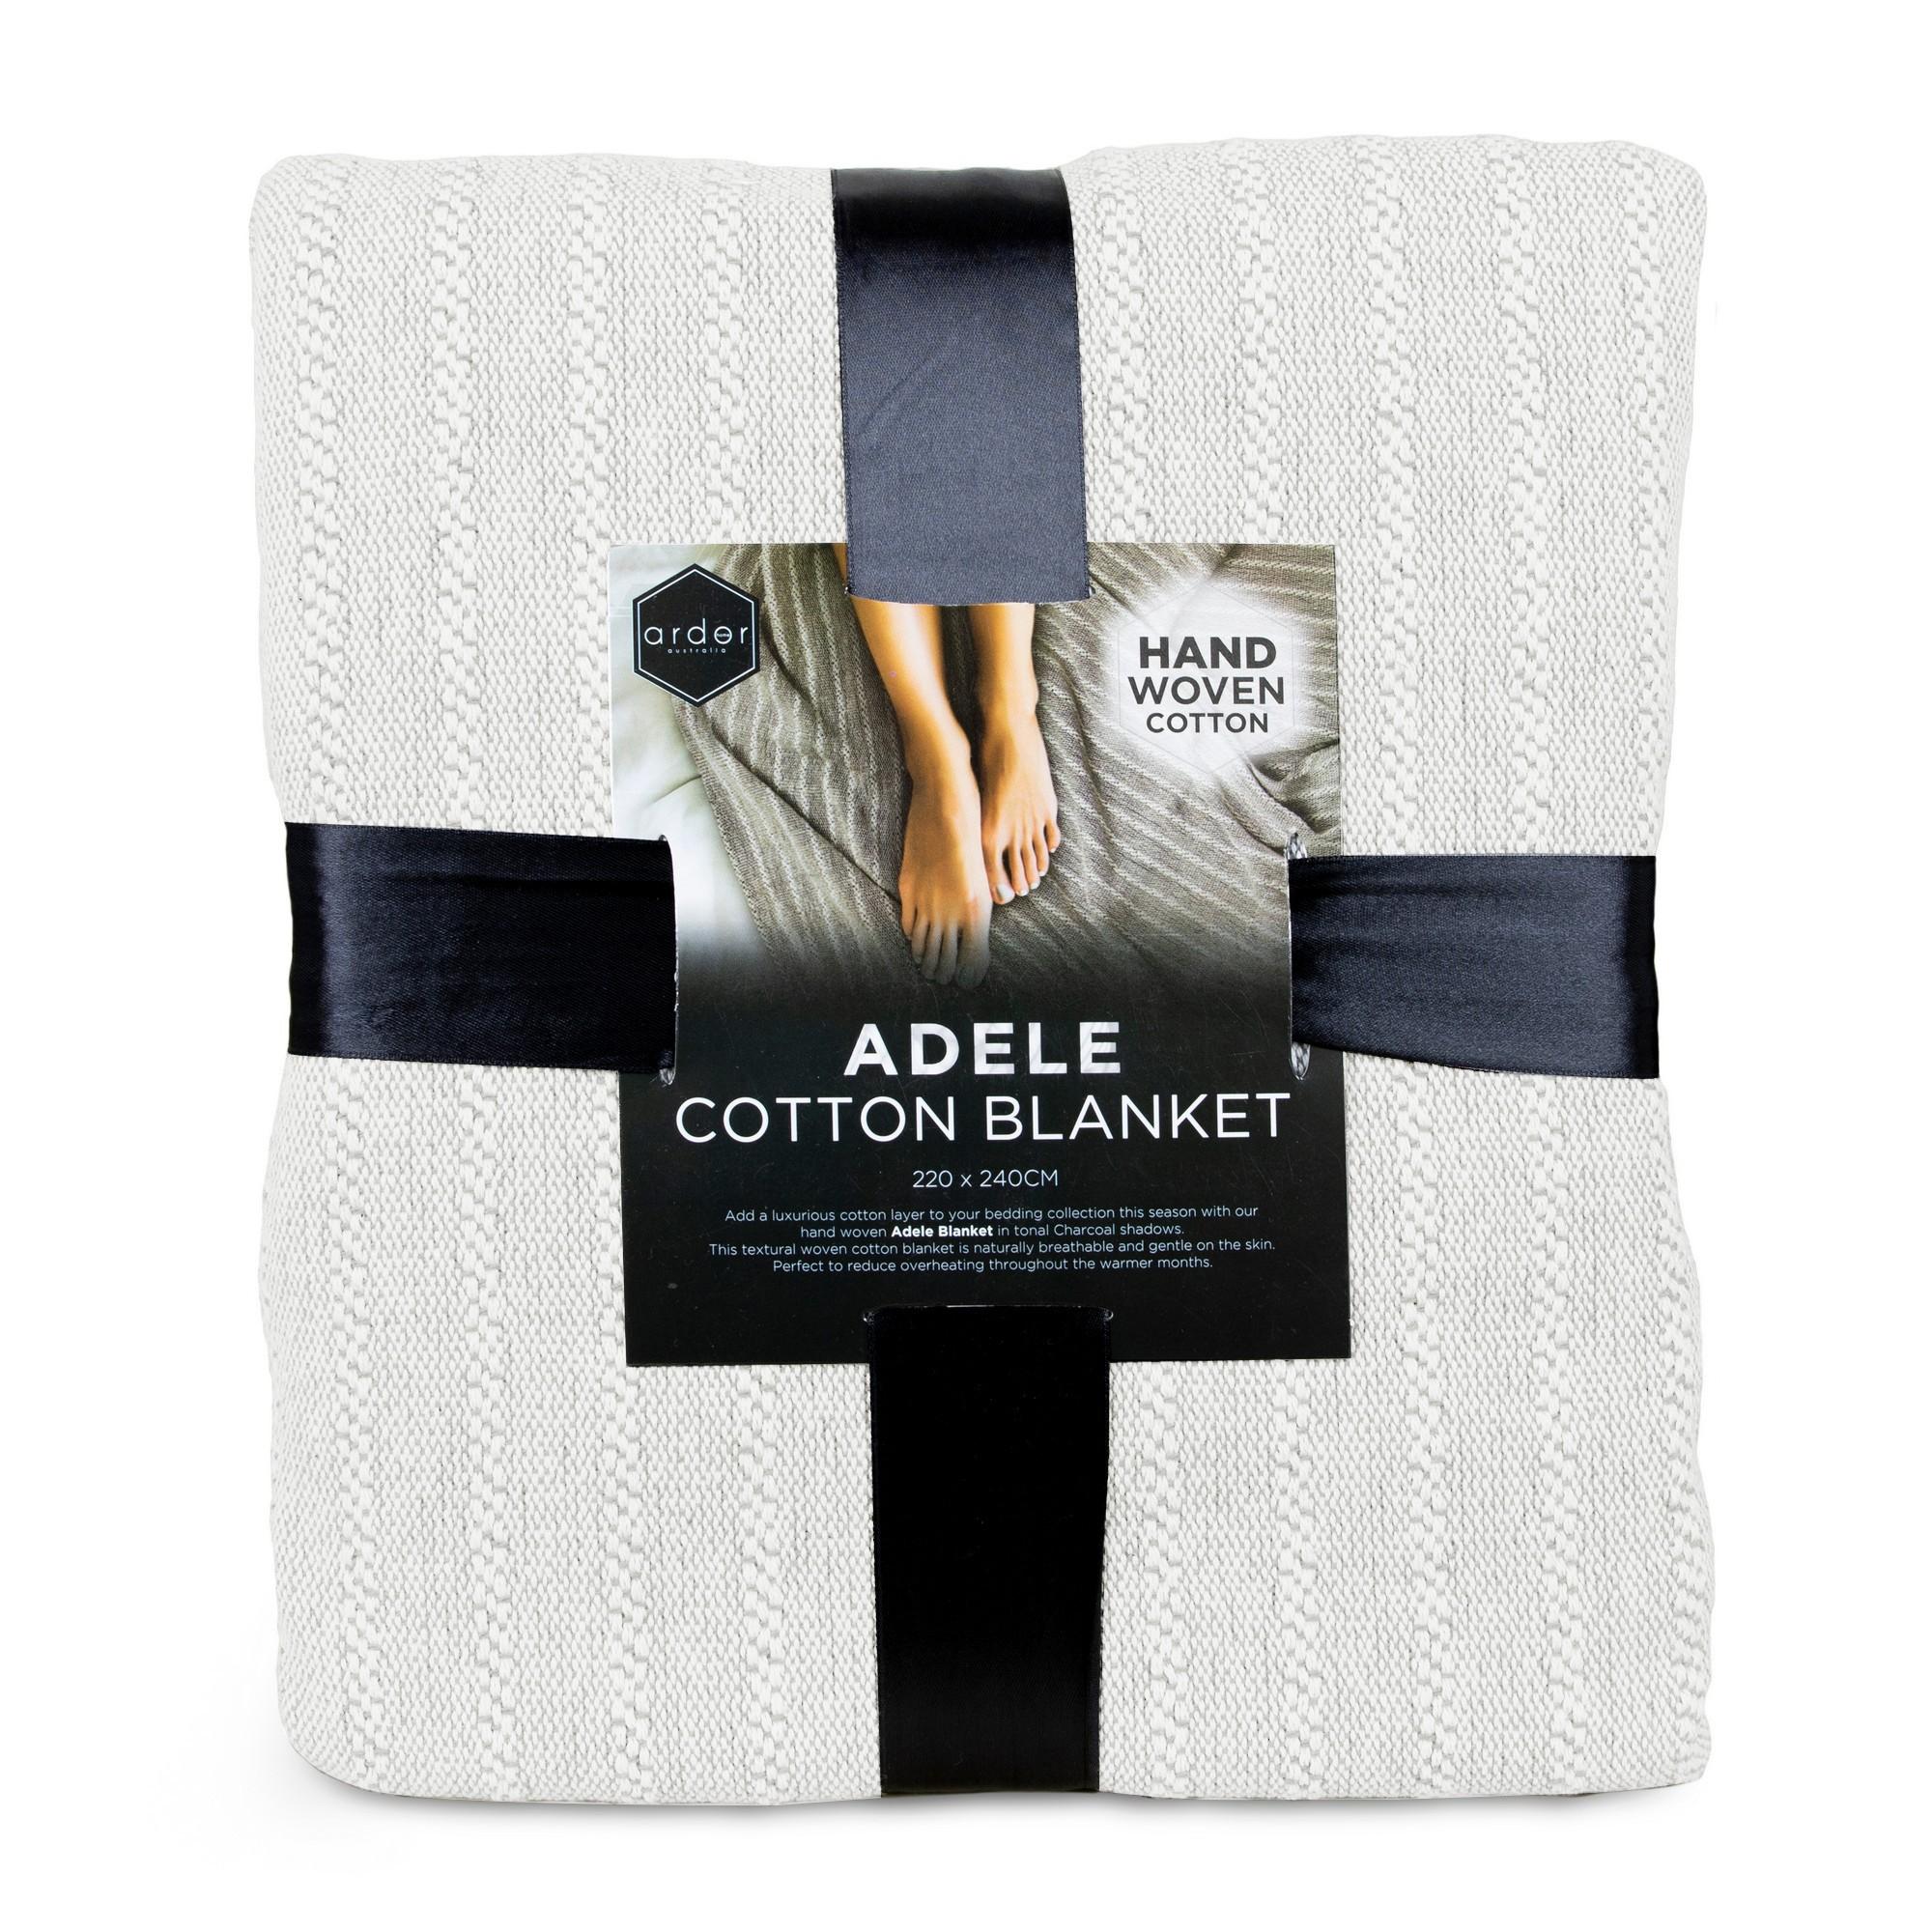 Ardor Adele Hand Woven Cotton Blanket, 220x240cm, Coconut Milk